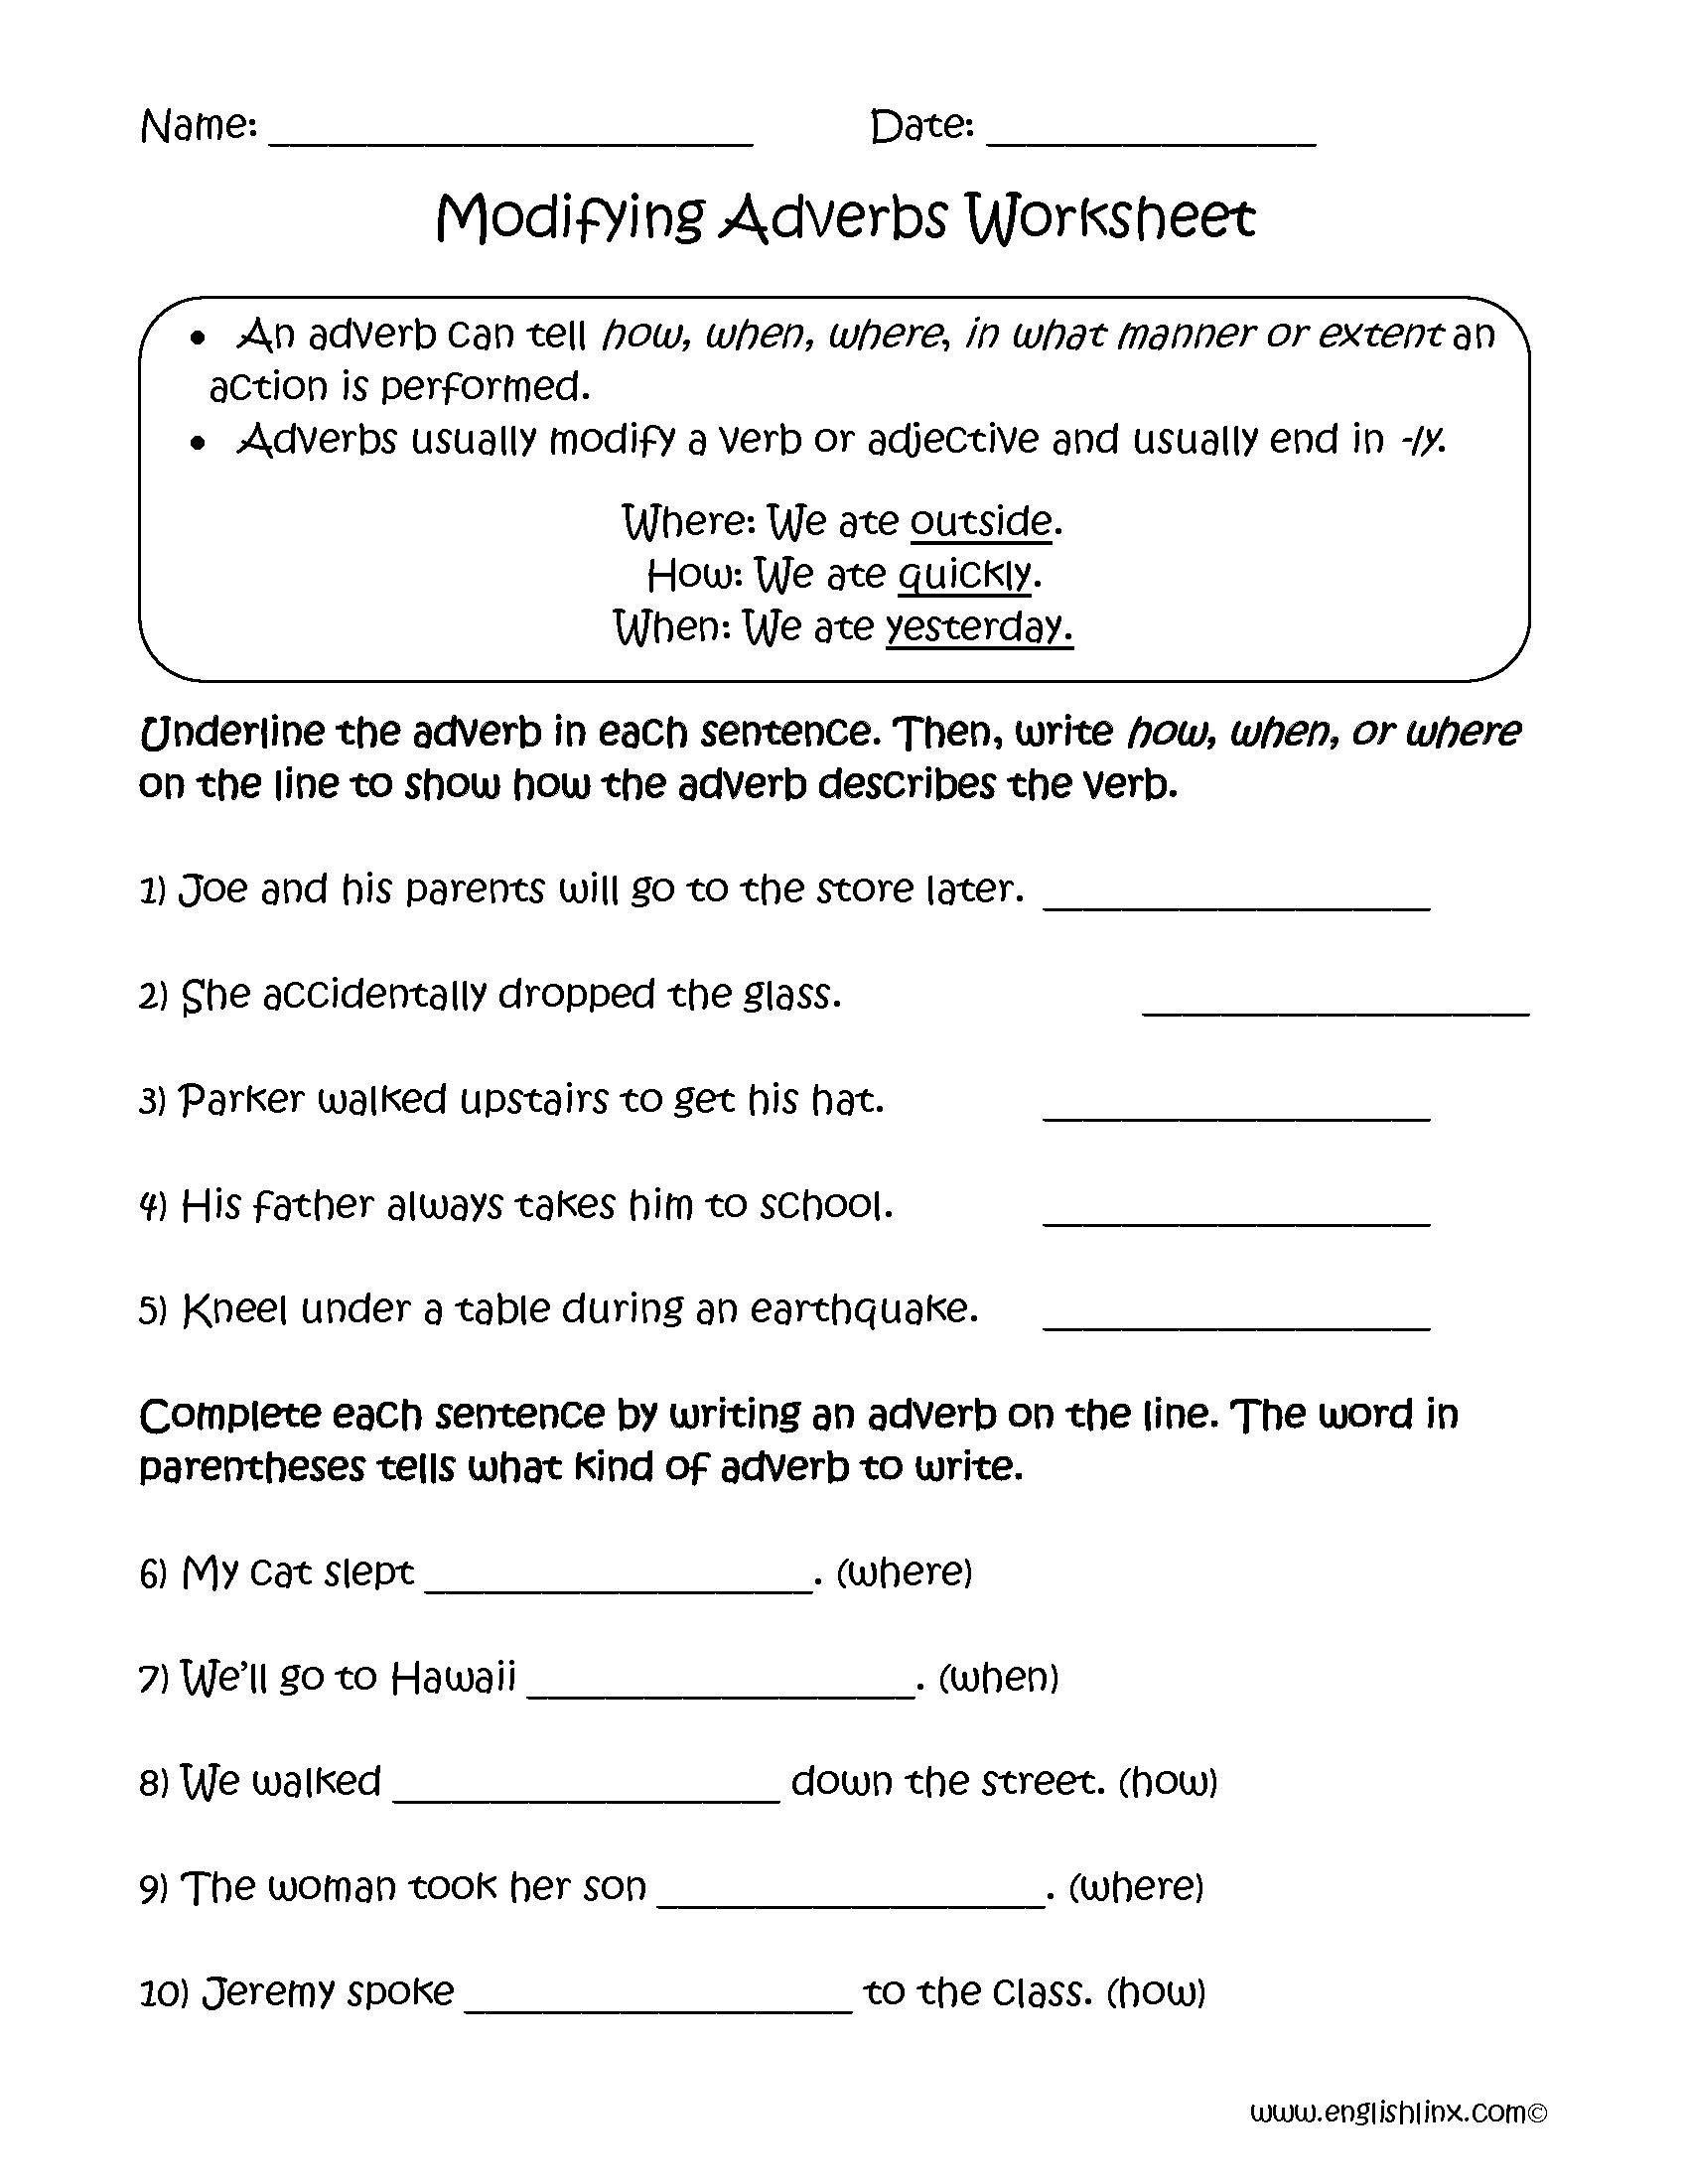 modifying adverbs worksheets board adverbs worksheet adverbs grammar. Black Bedroom Furniture Sets. Home Design Ideas